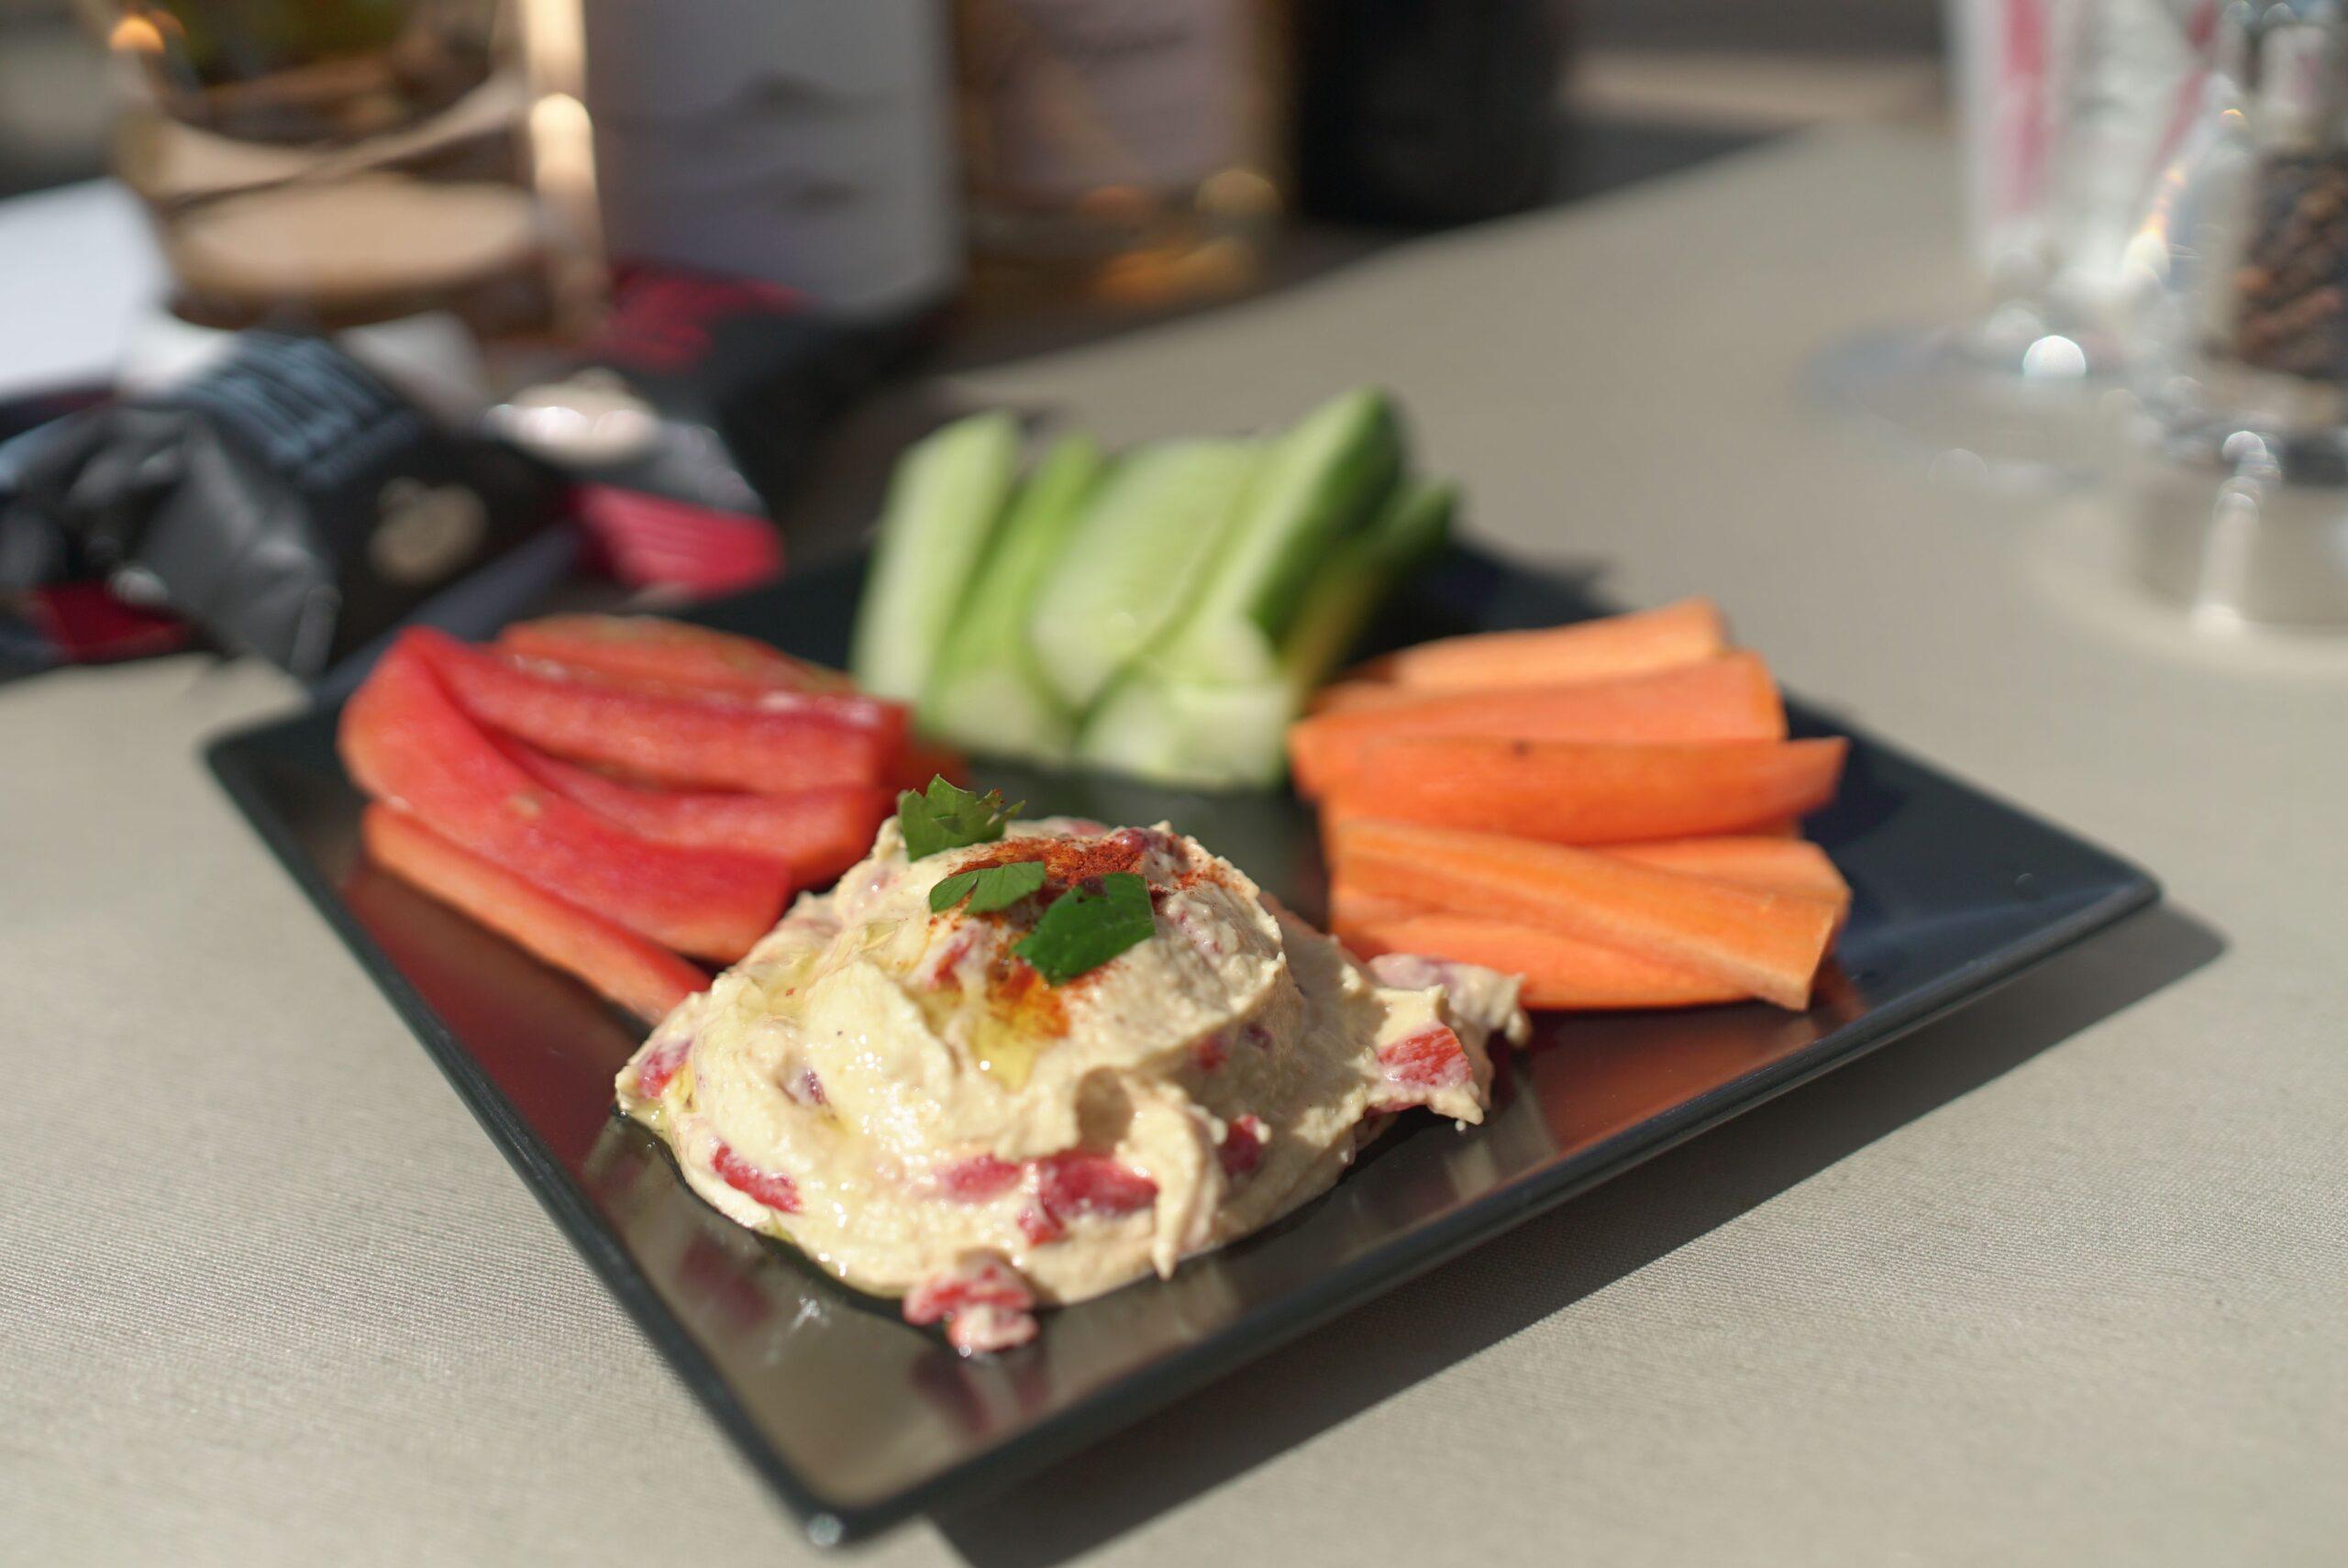 Starter - Hummus